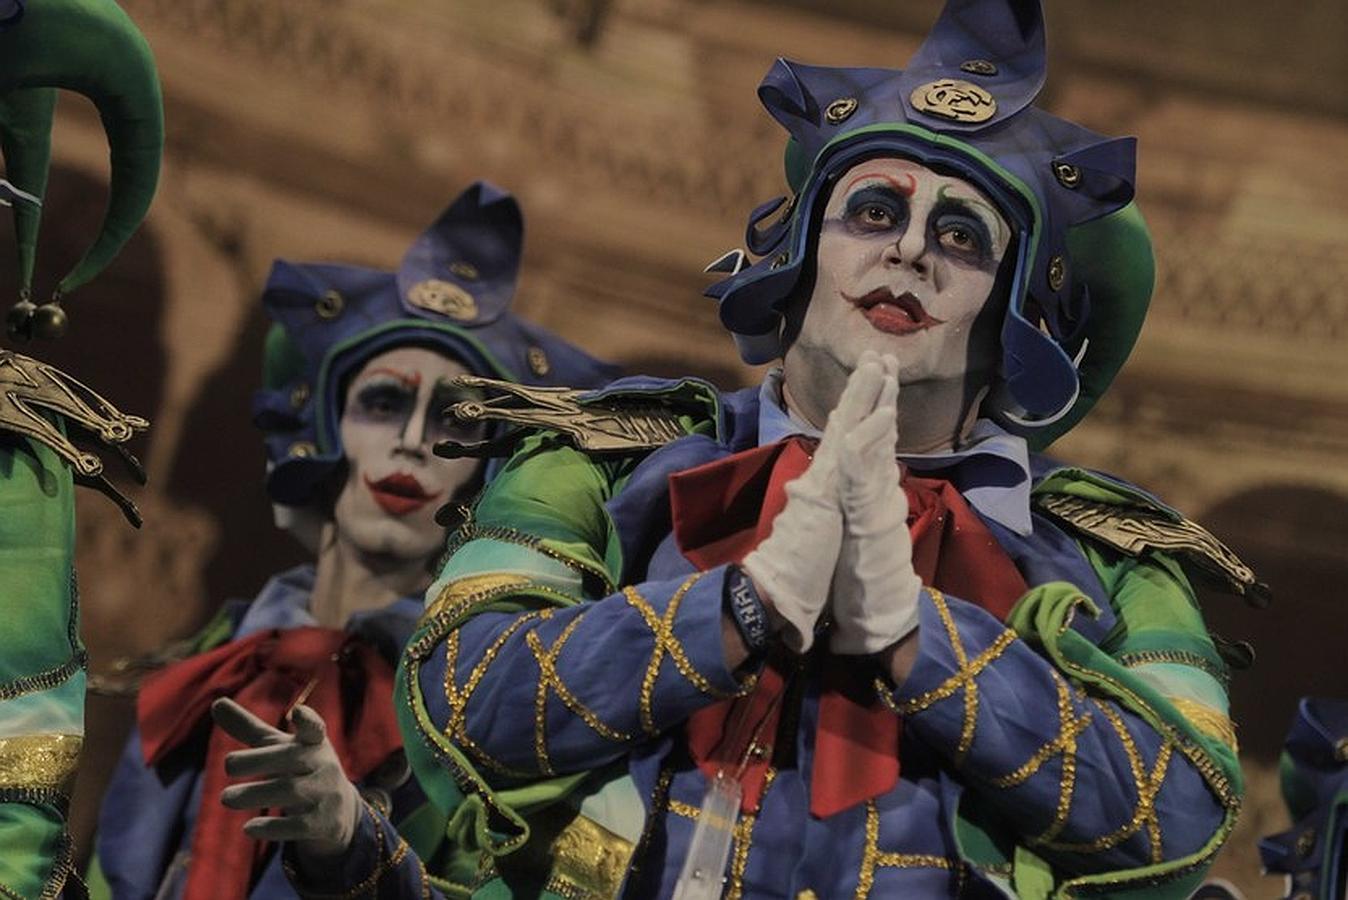 La comparsa El Reino de Don Carnal, premio Fermín Salvochea